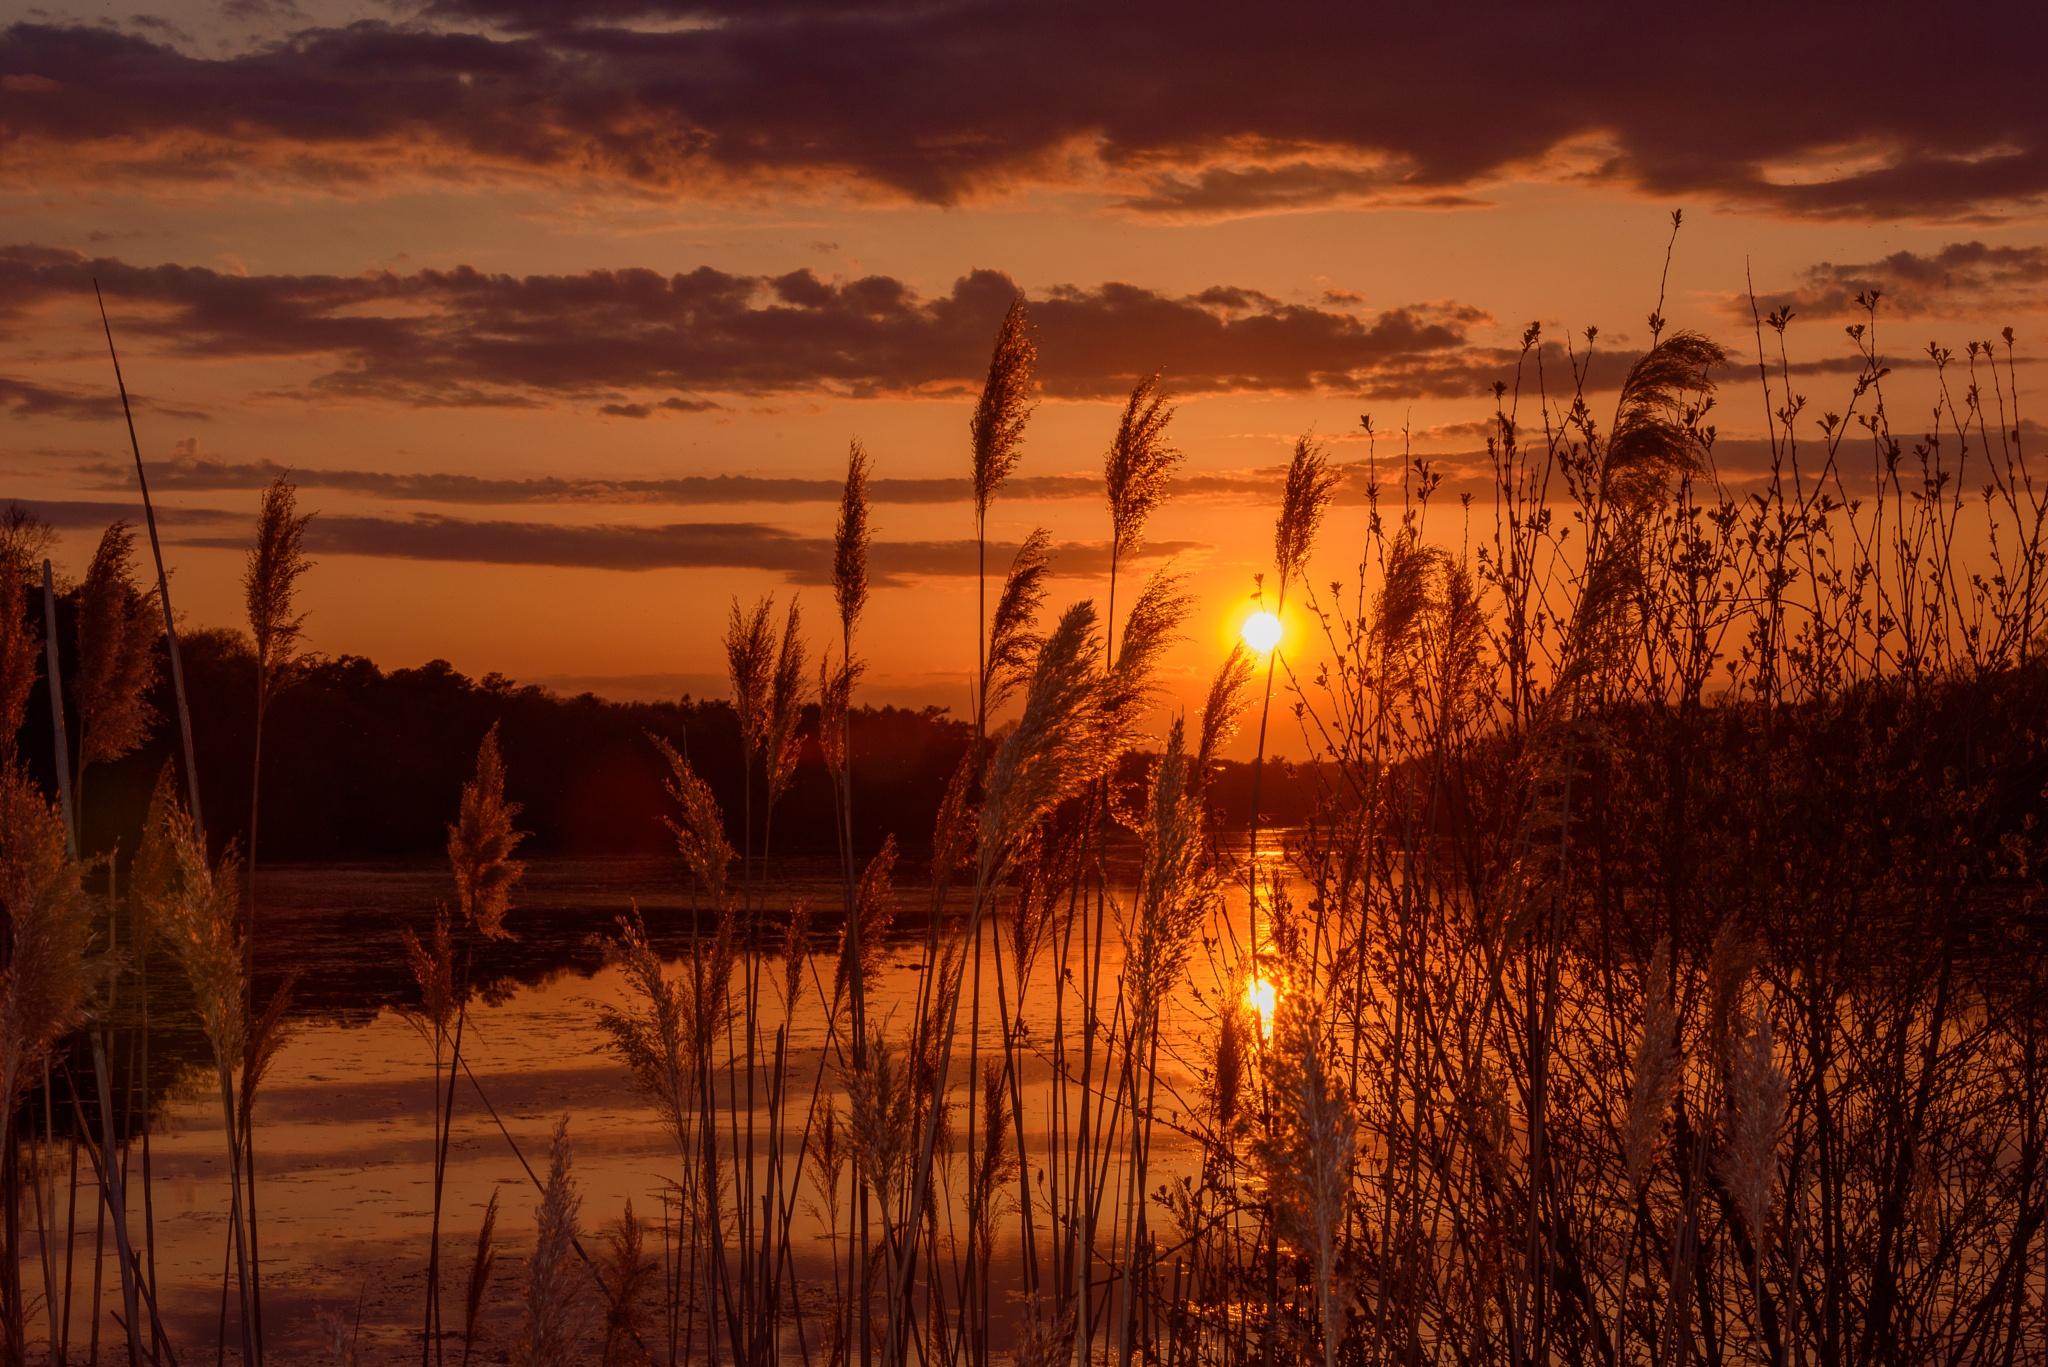 Golden Reeds by Tom Lambui